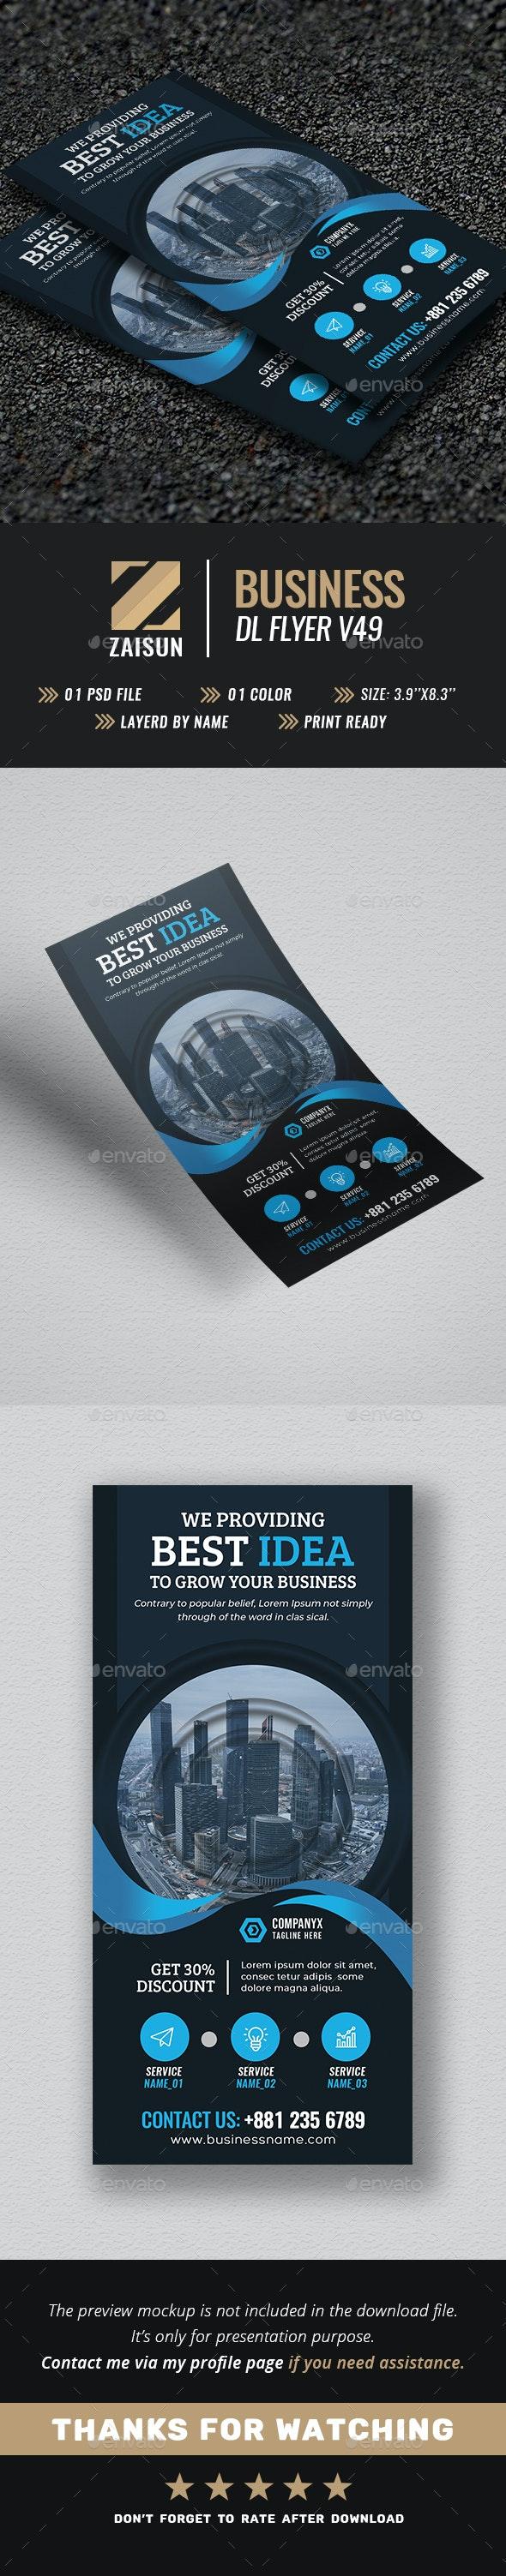 Business DL Flyer V49 - Flyers Print Templates